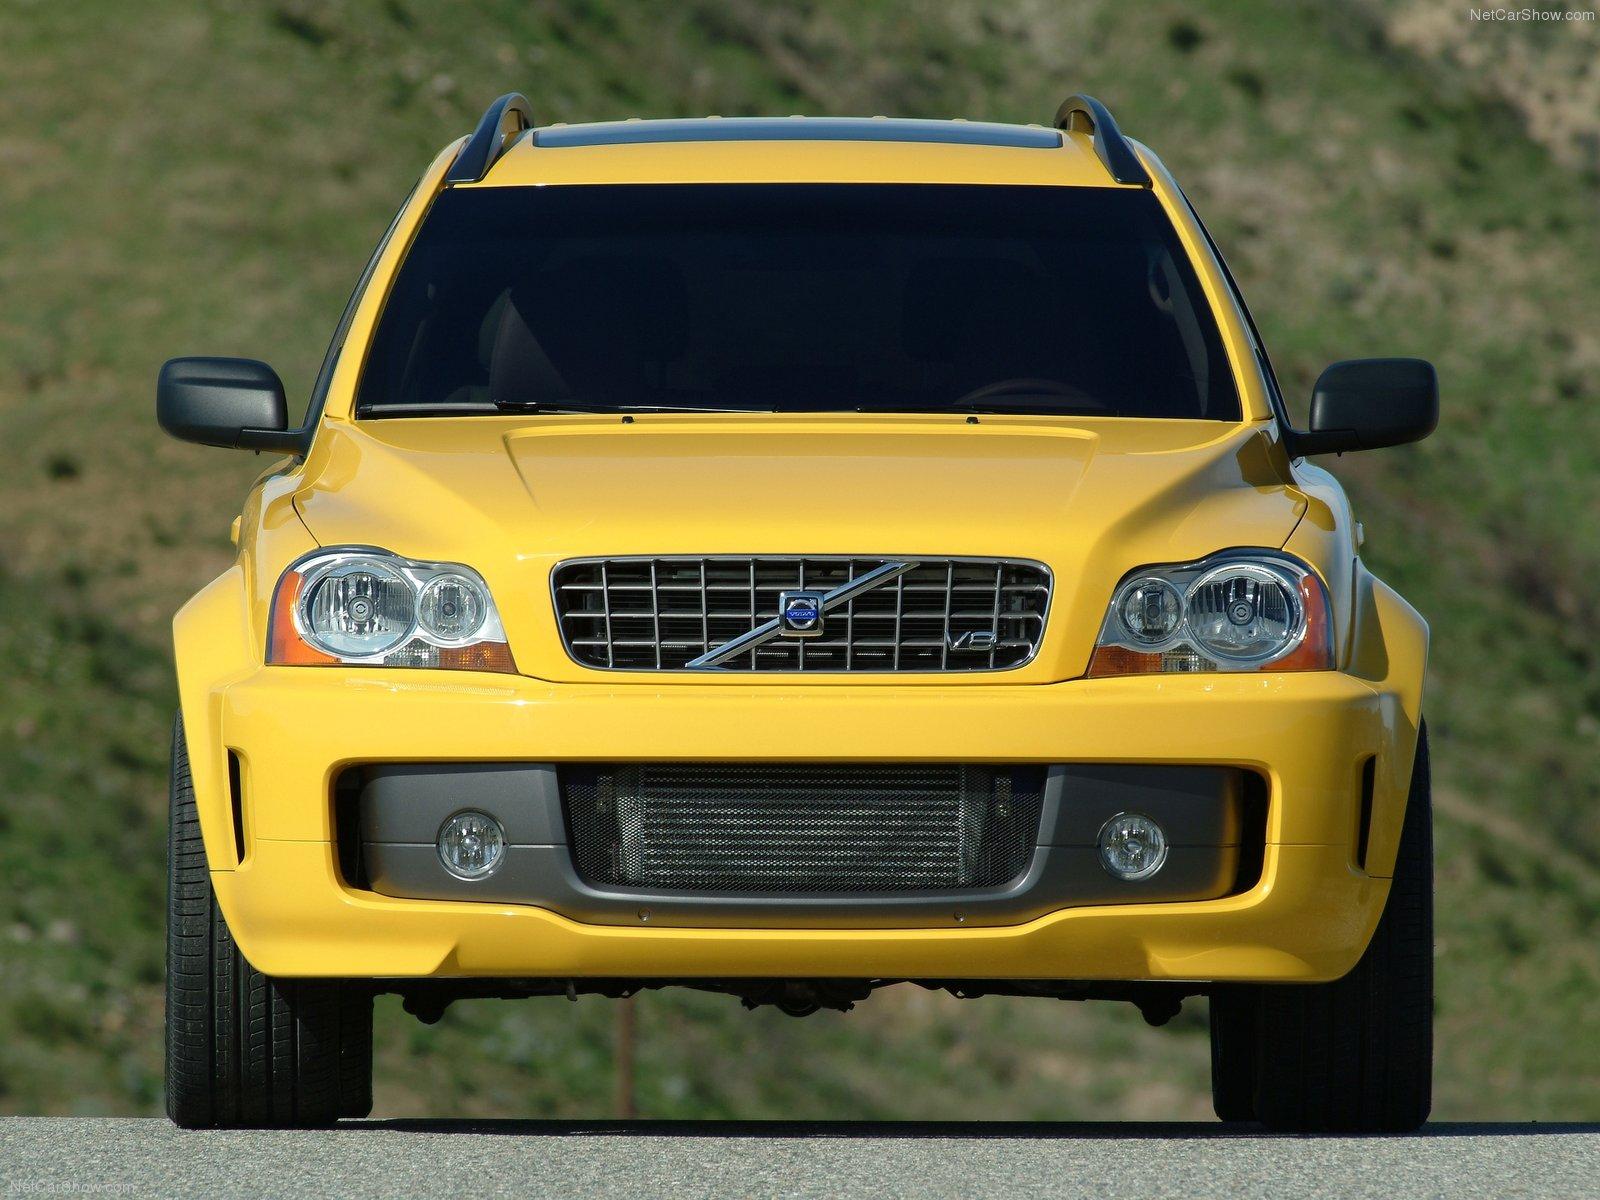 Volvo XC90 Supercharged V8 2005 Volvo-XC90_Supercharged_V8-2005-1600-0b